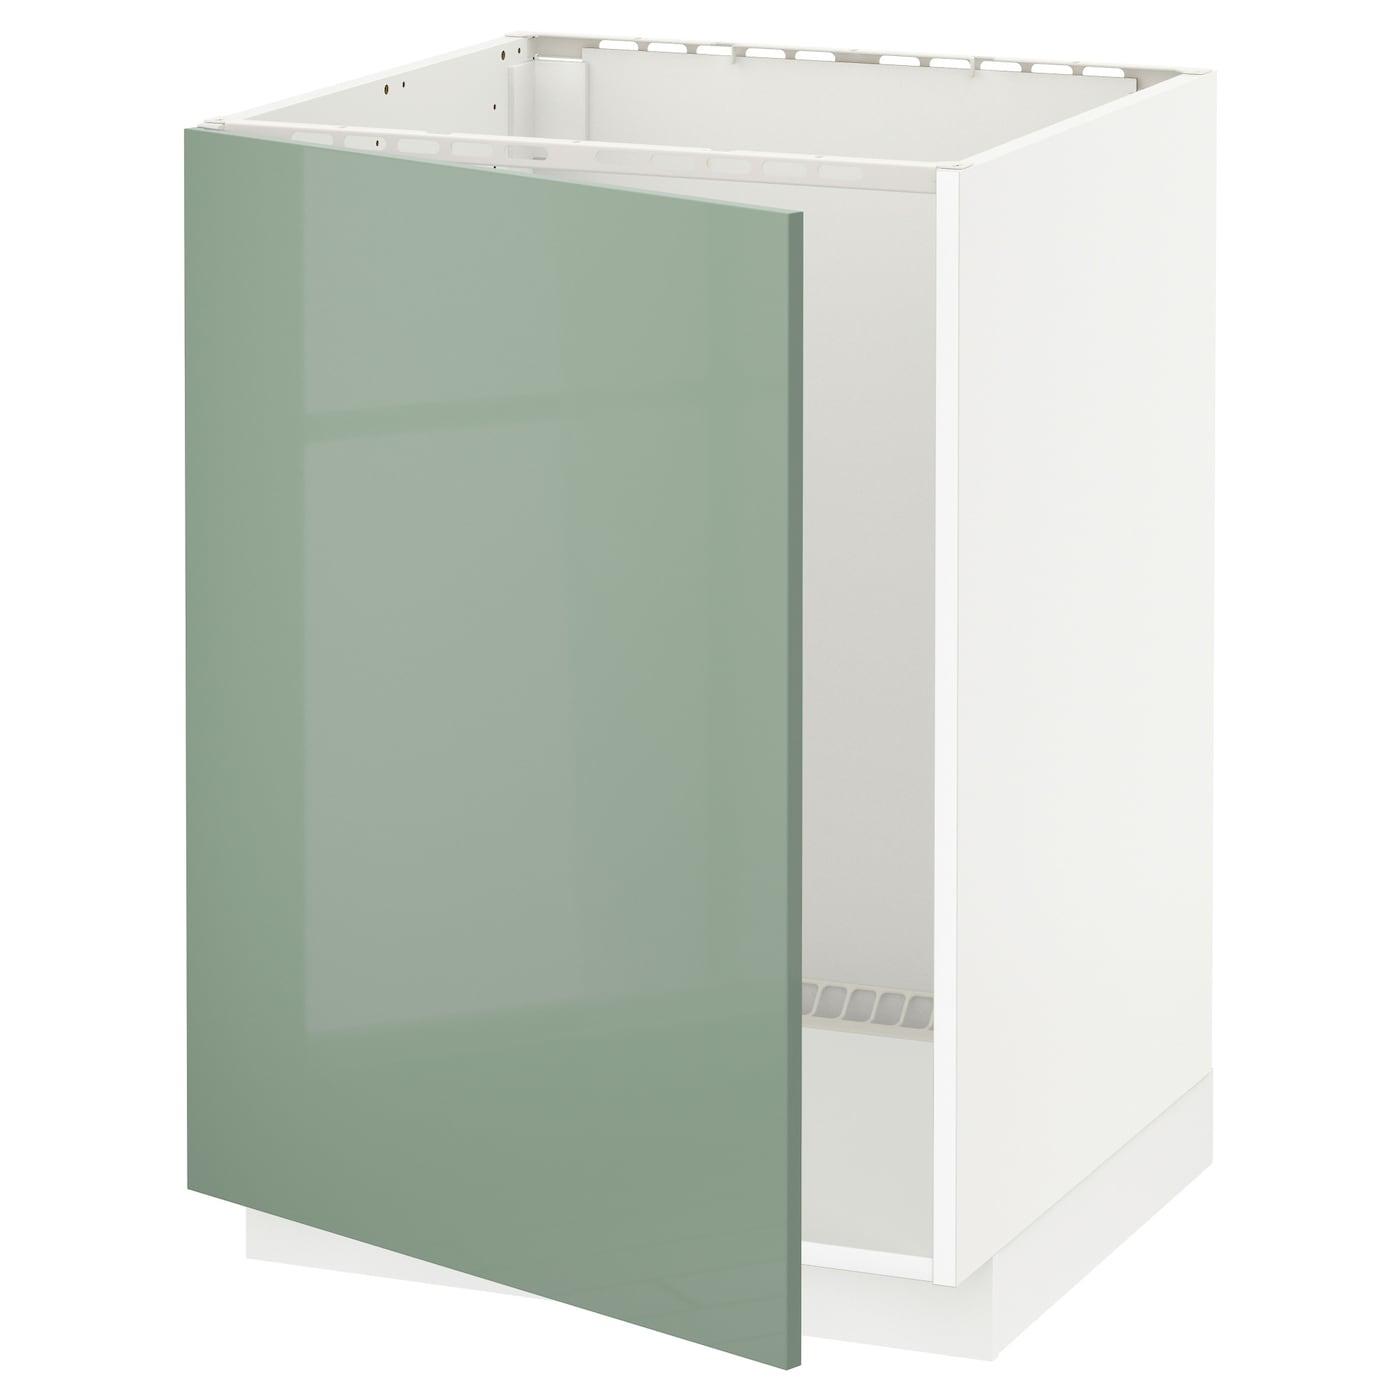 Ikea Green Kitchen Cabinets: METOD Base Cabinet For Sink White/kallarp Light Green